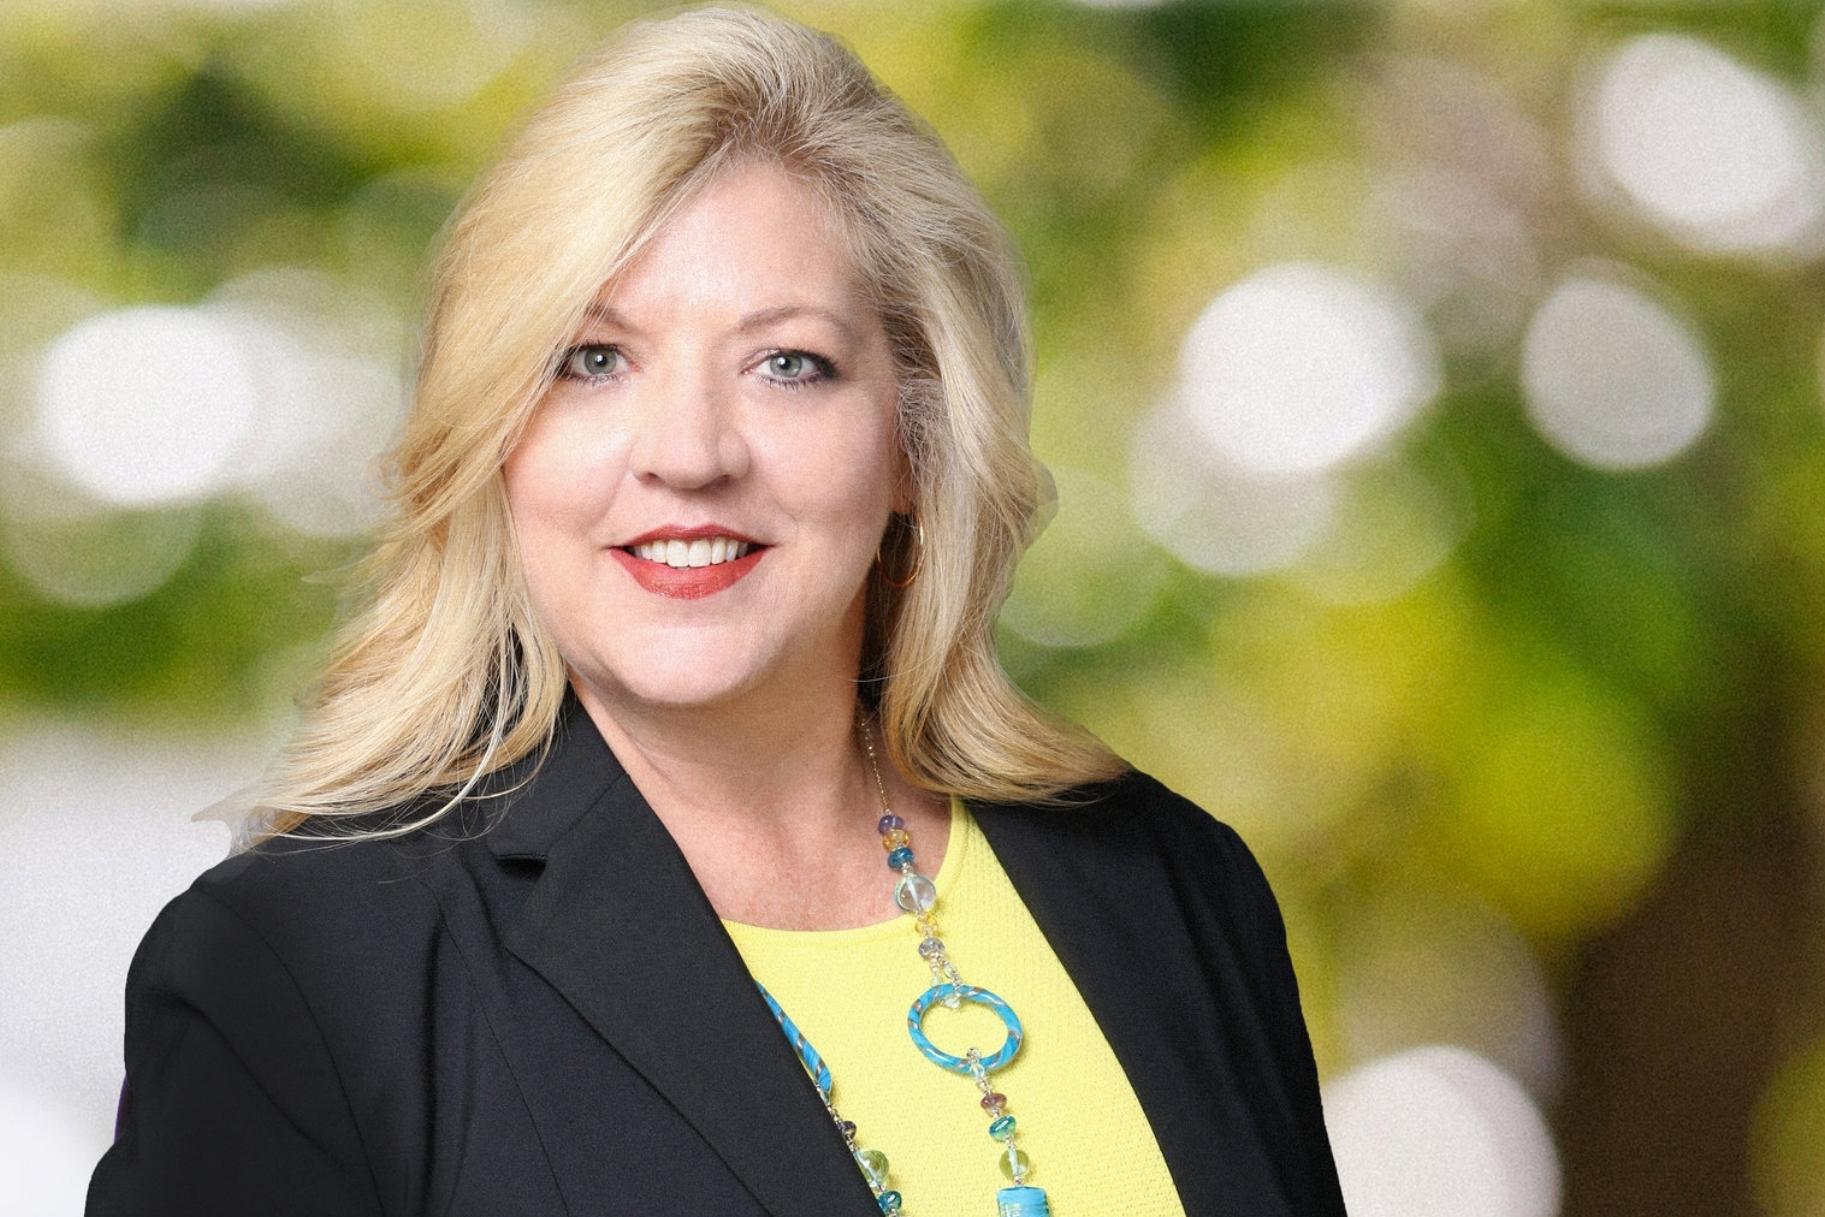 Christine Kissler